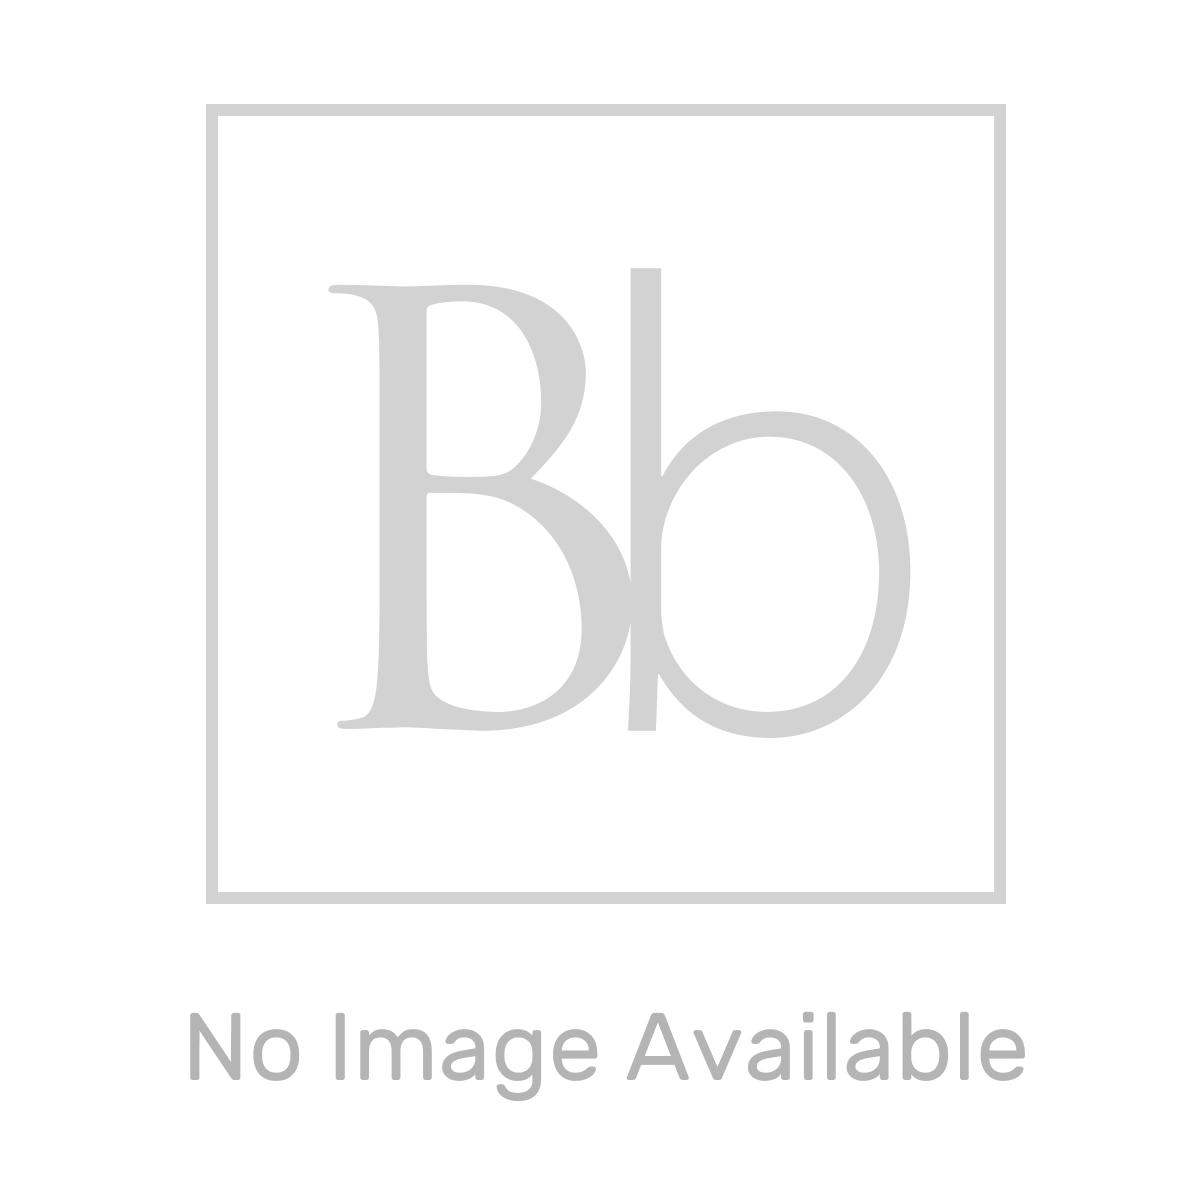 Premier Barmby Single Ended Bath 1700 x 700mm Dimensions